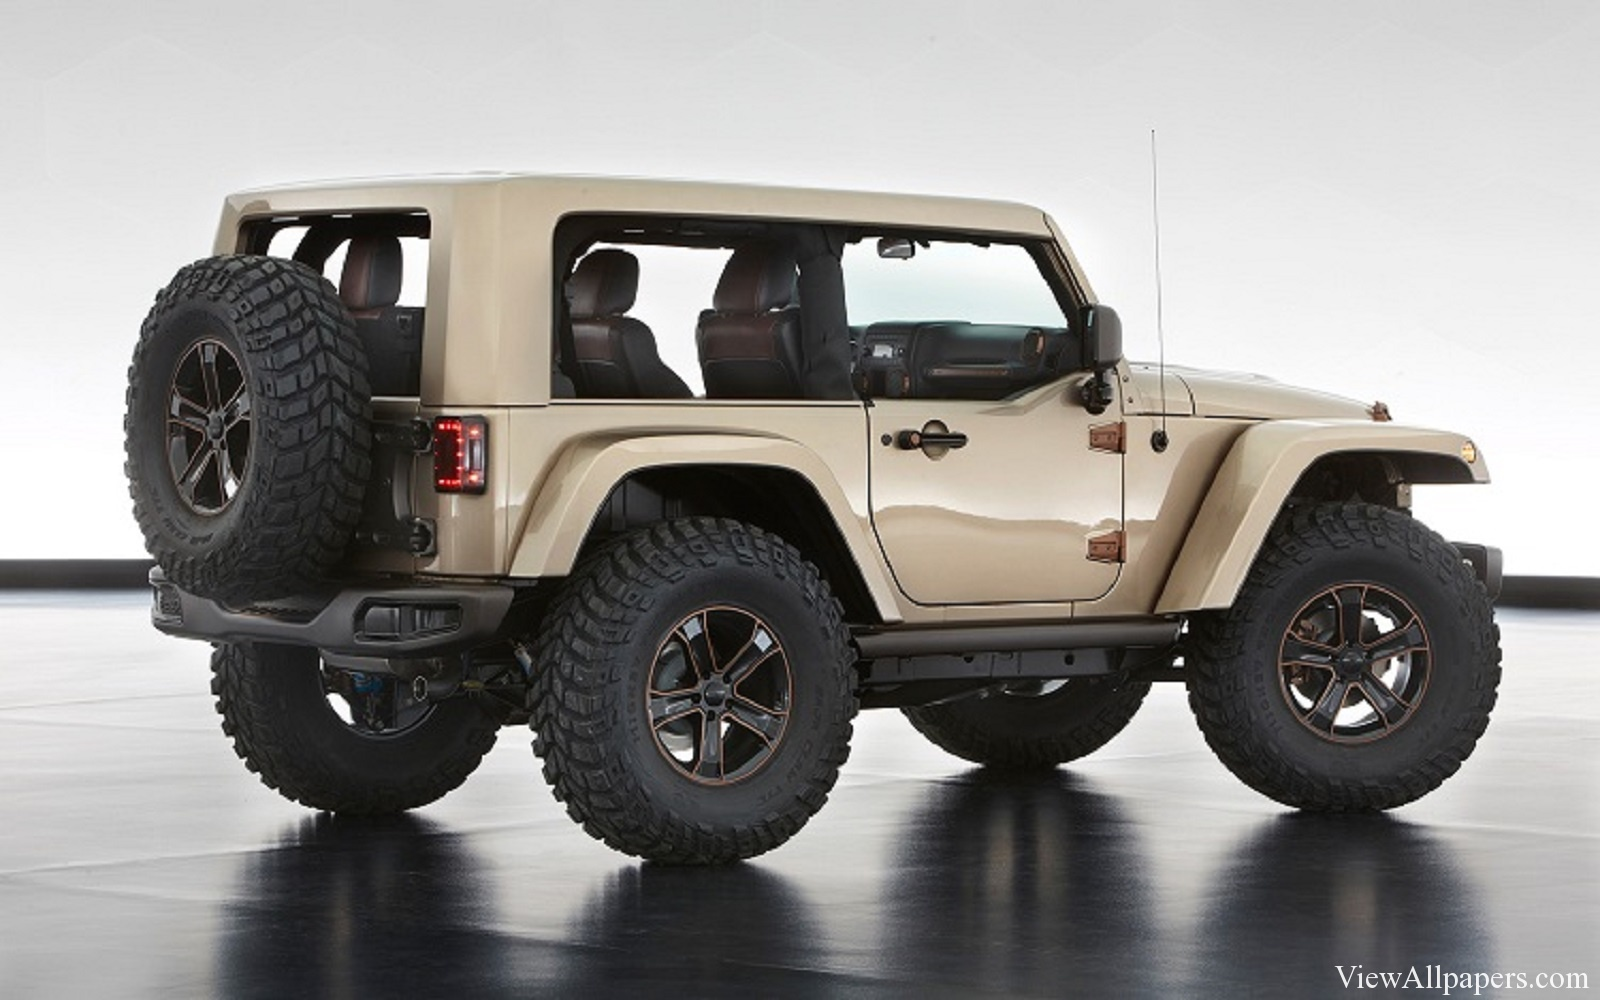 2017 Jeep Wrangler Photos High Resolution Wallpaper download 1600x1000